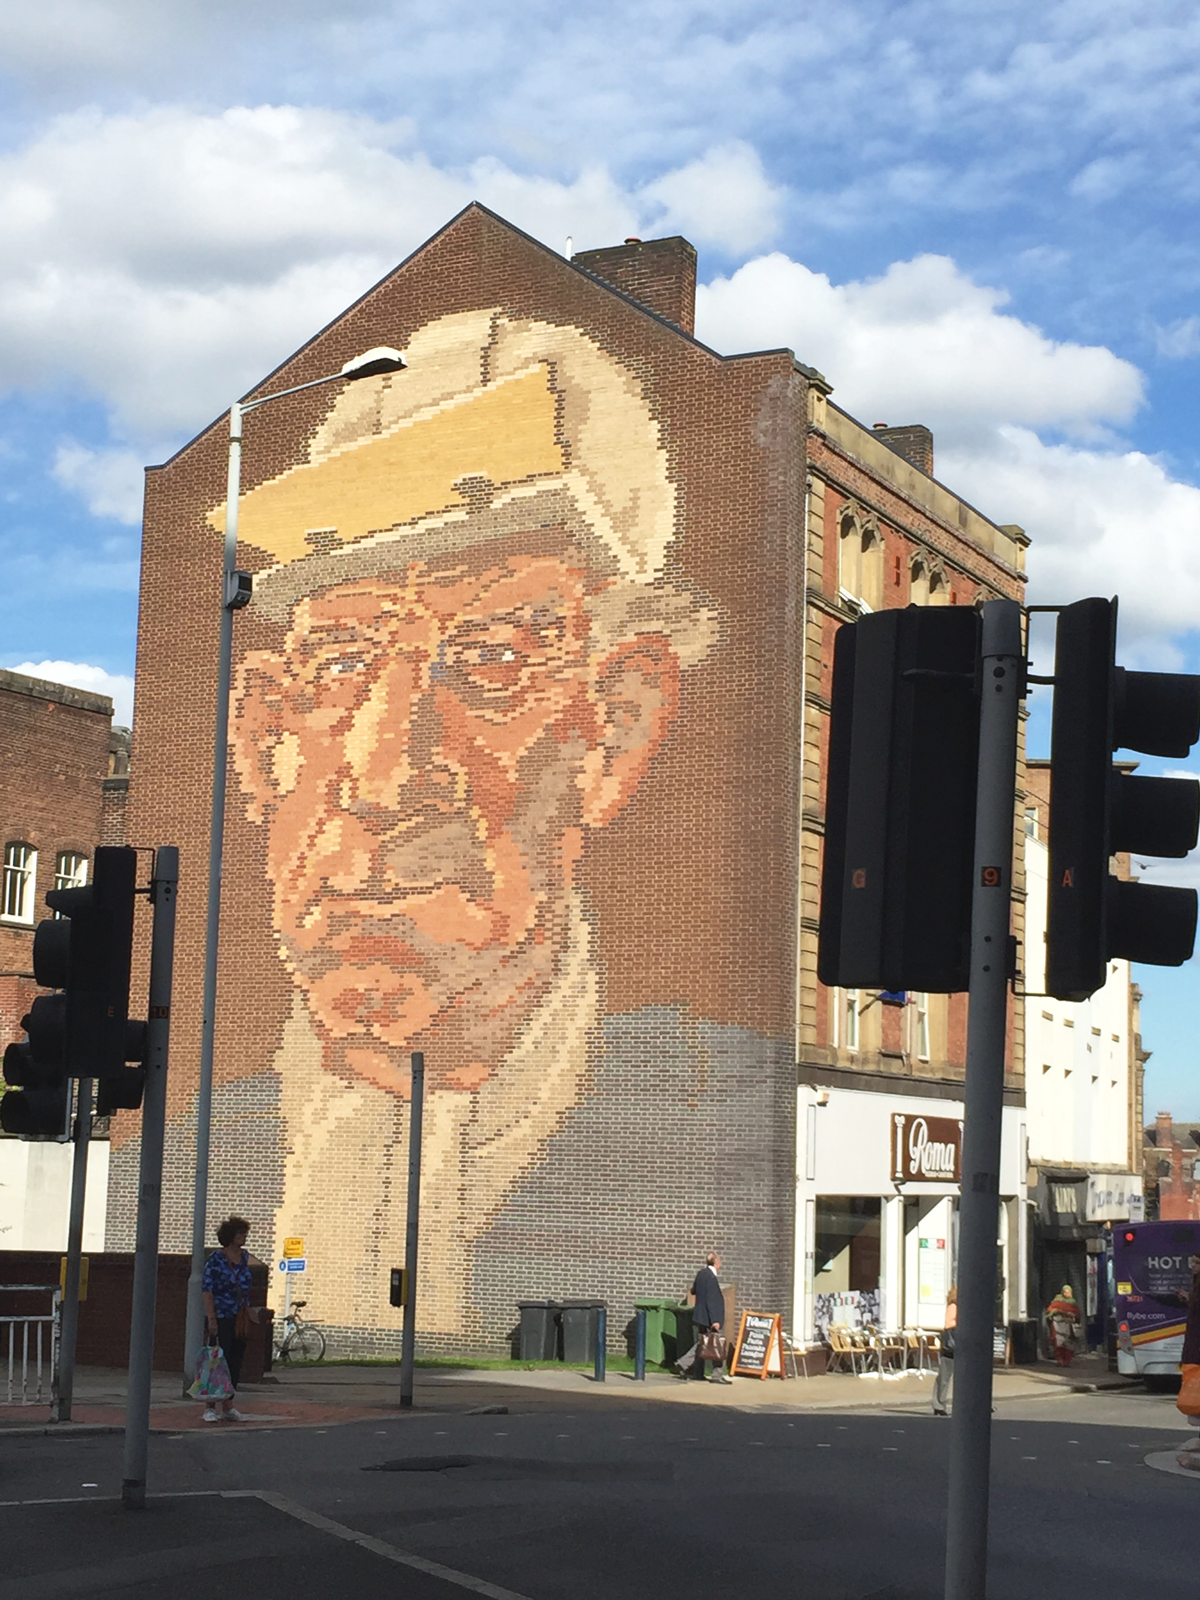 Sheffield augusti 2016